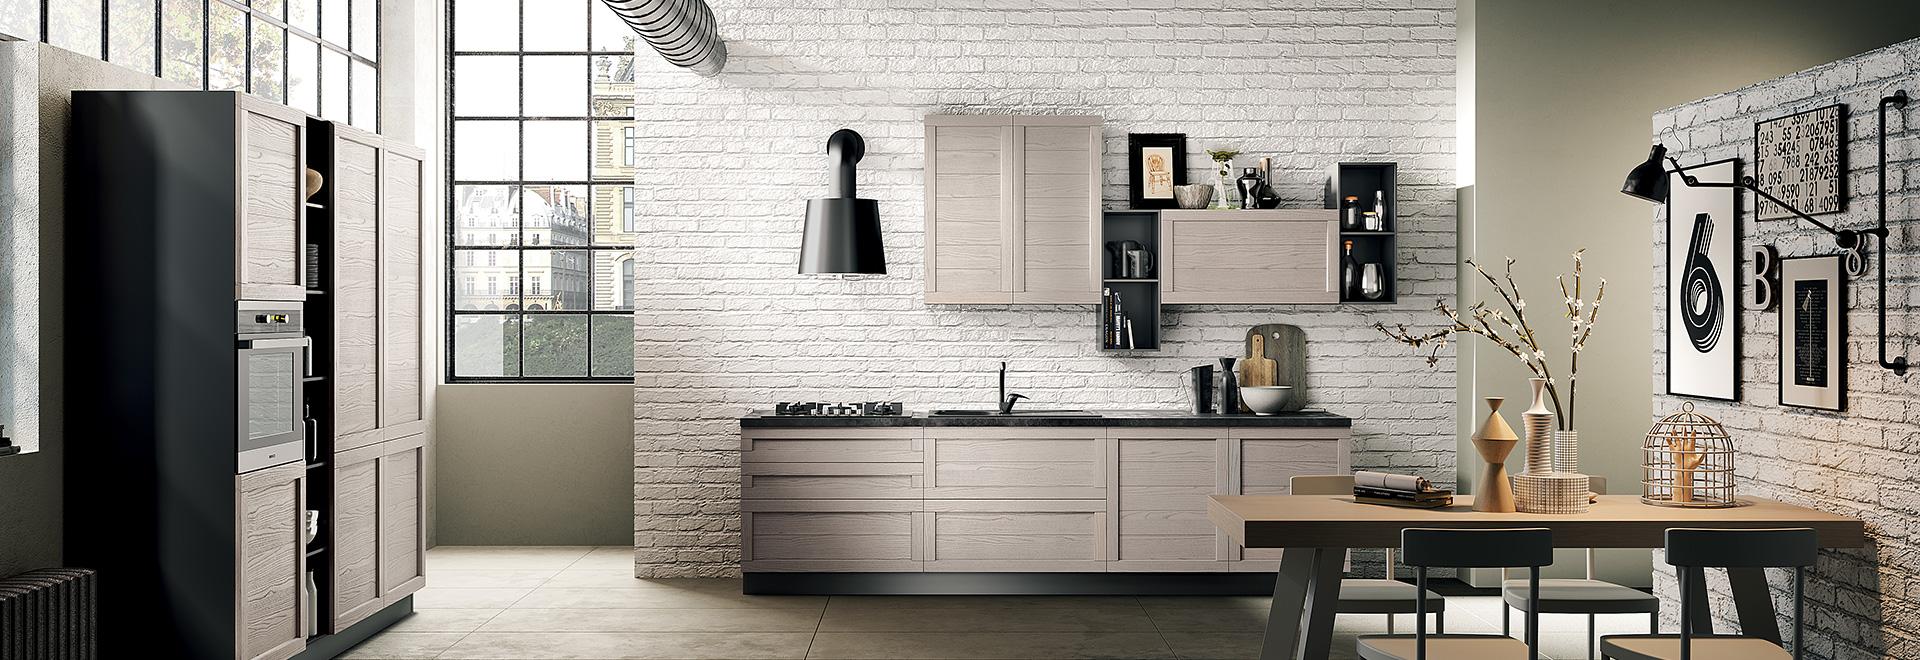 HS Cucine living Genova, Cucine moderne Genova, Cucine su ...